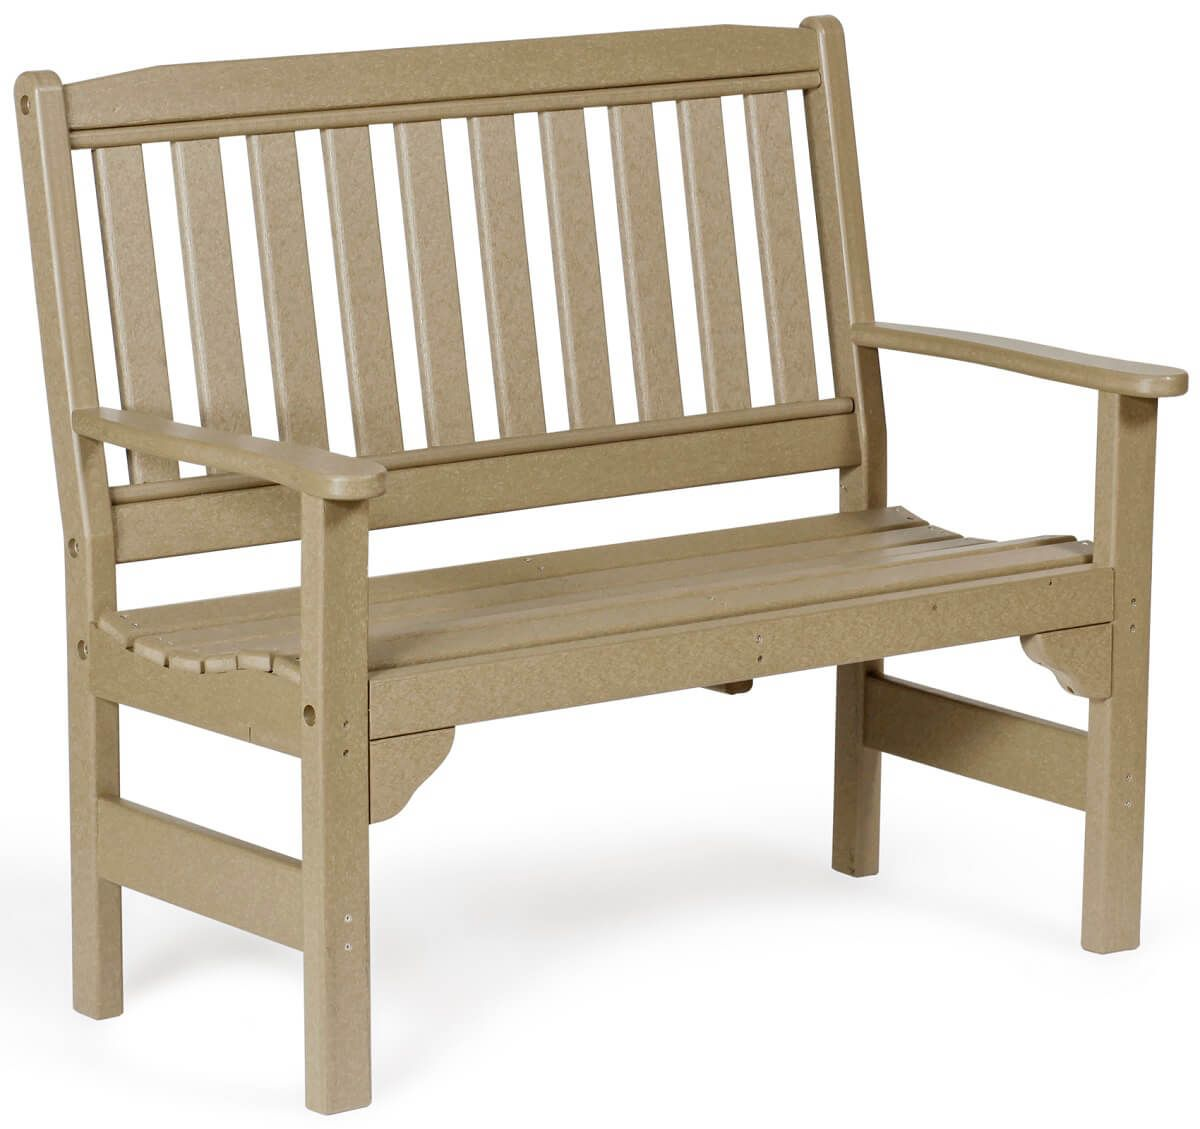 Cavendish Patio Bench